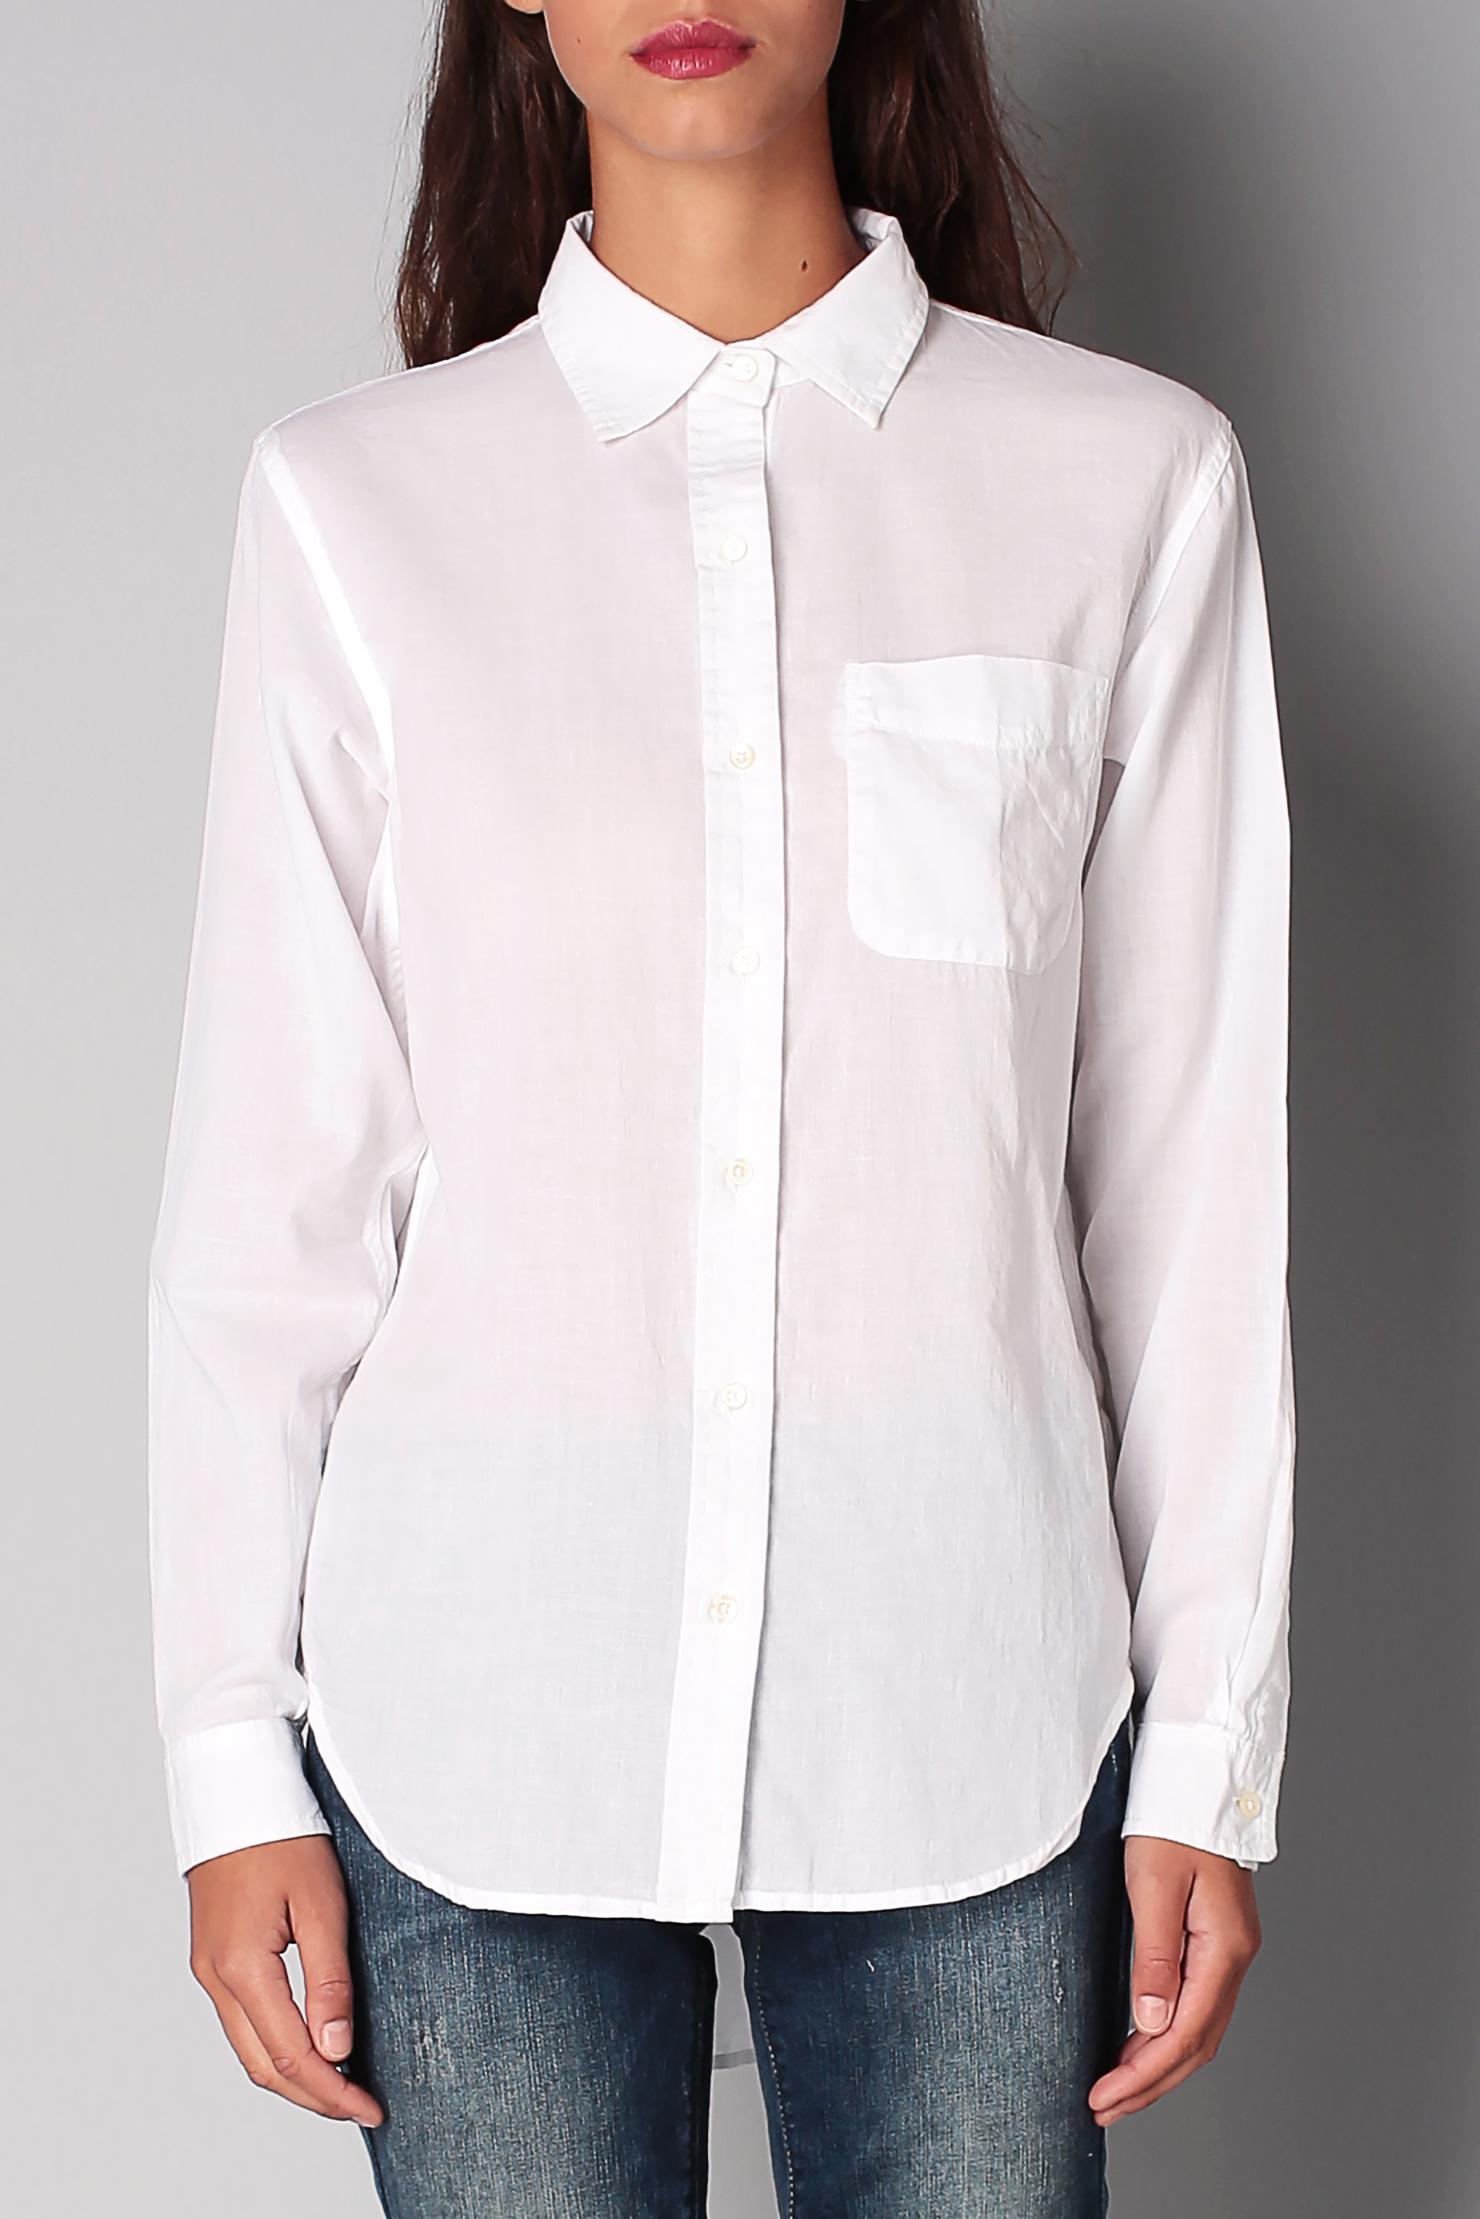 denim supply ralph lauren shirt blouse in white lyst. Black Bedroom Furniture Sets. Home Design Ideas